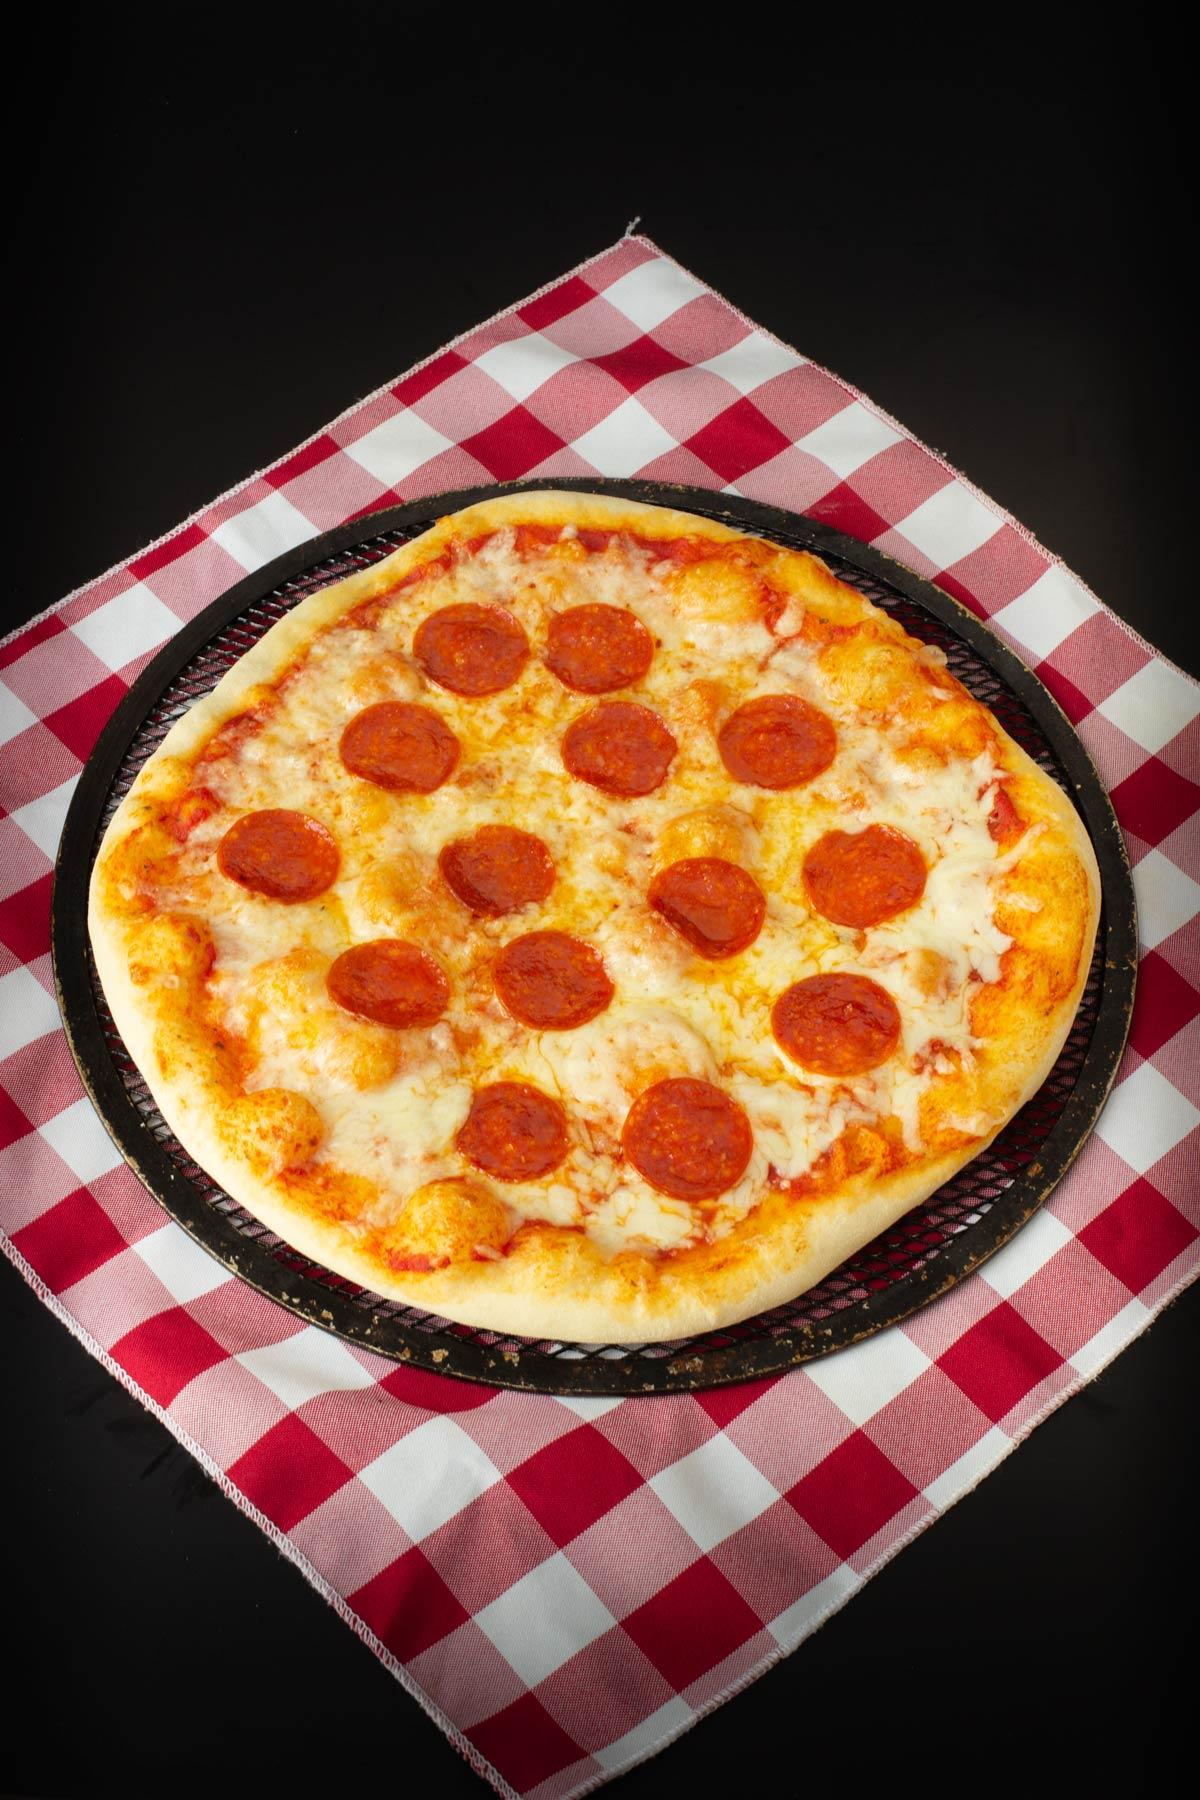 cooked pepperoni sourdough pizza on a checker napkin.